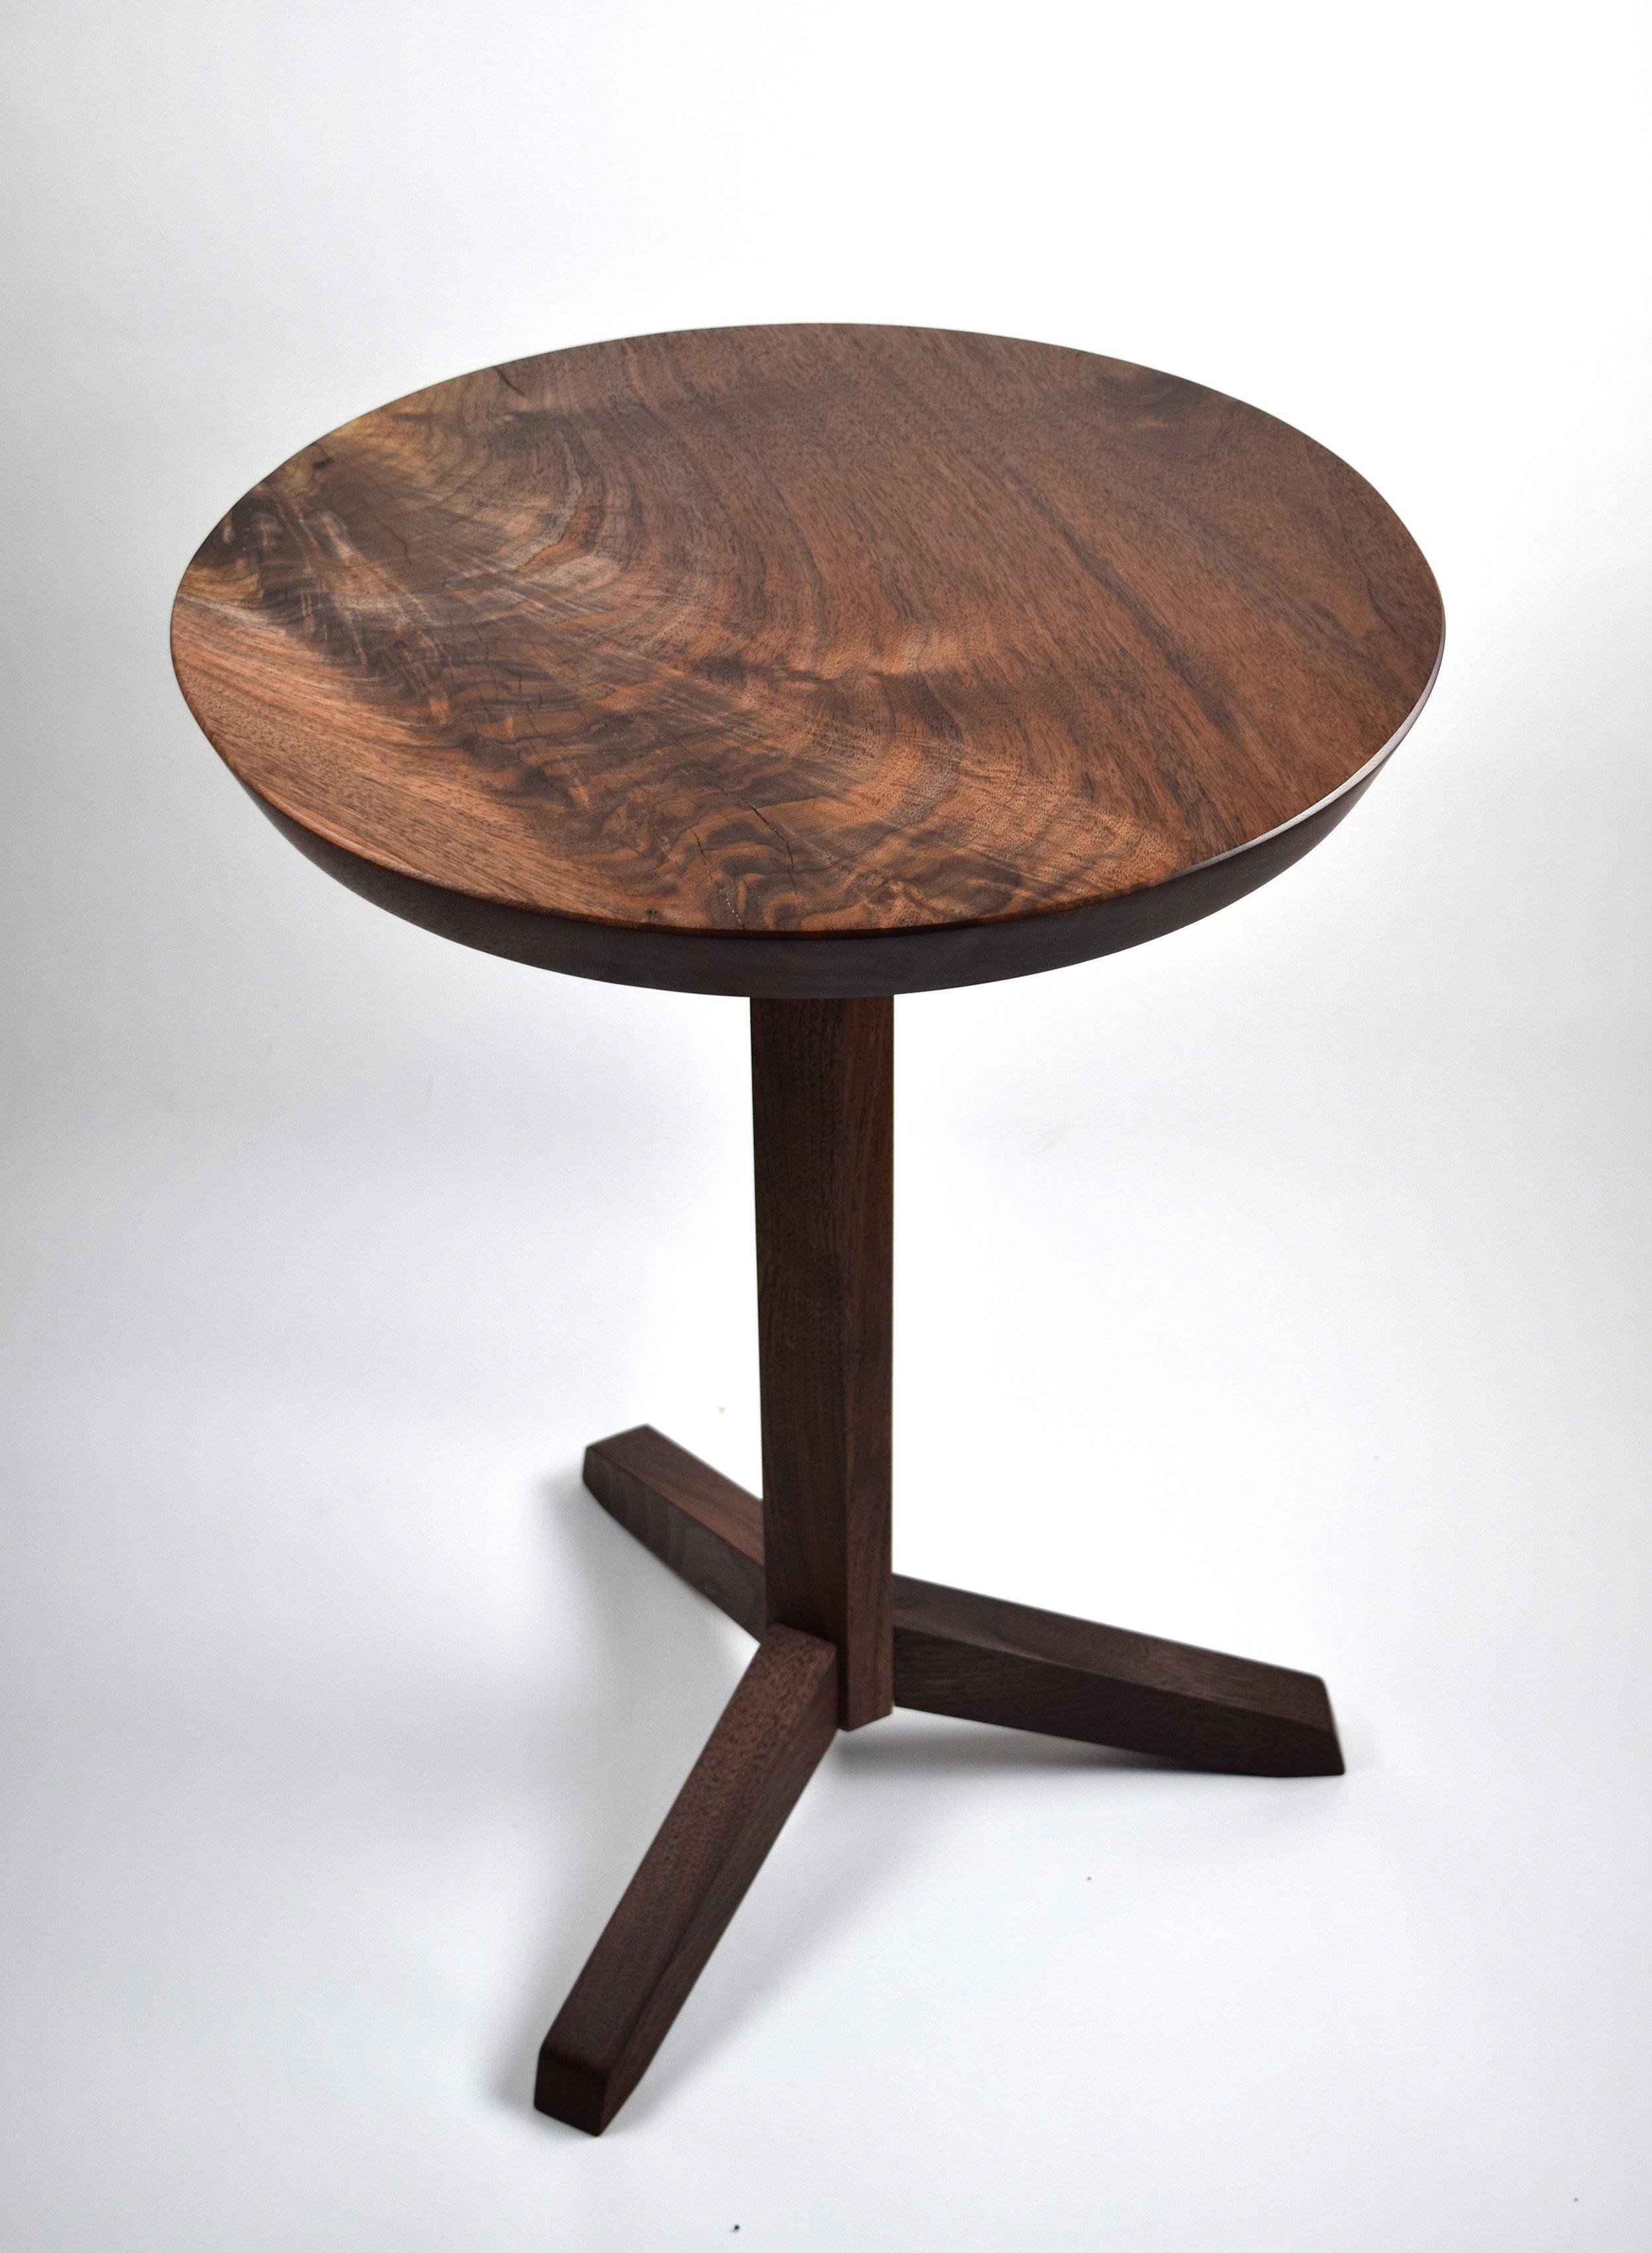 Modern Pedestal Table - Oregon Black Walnut